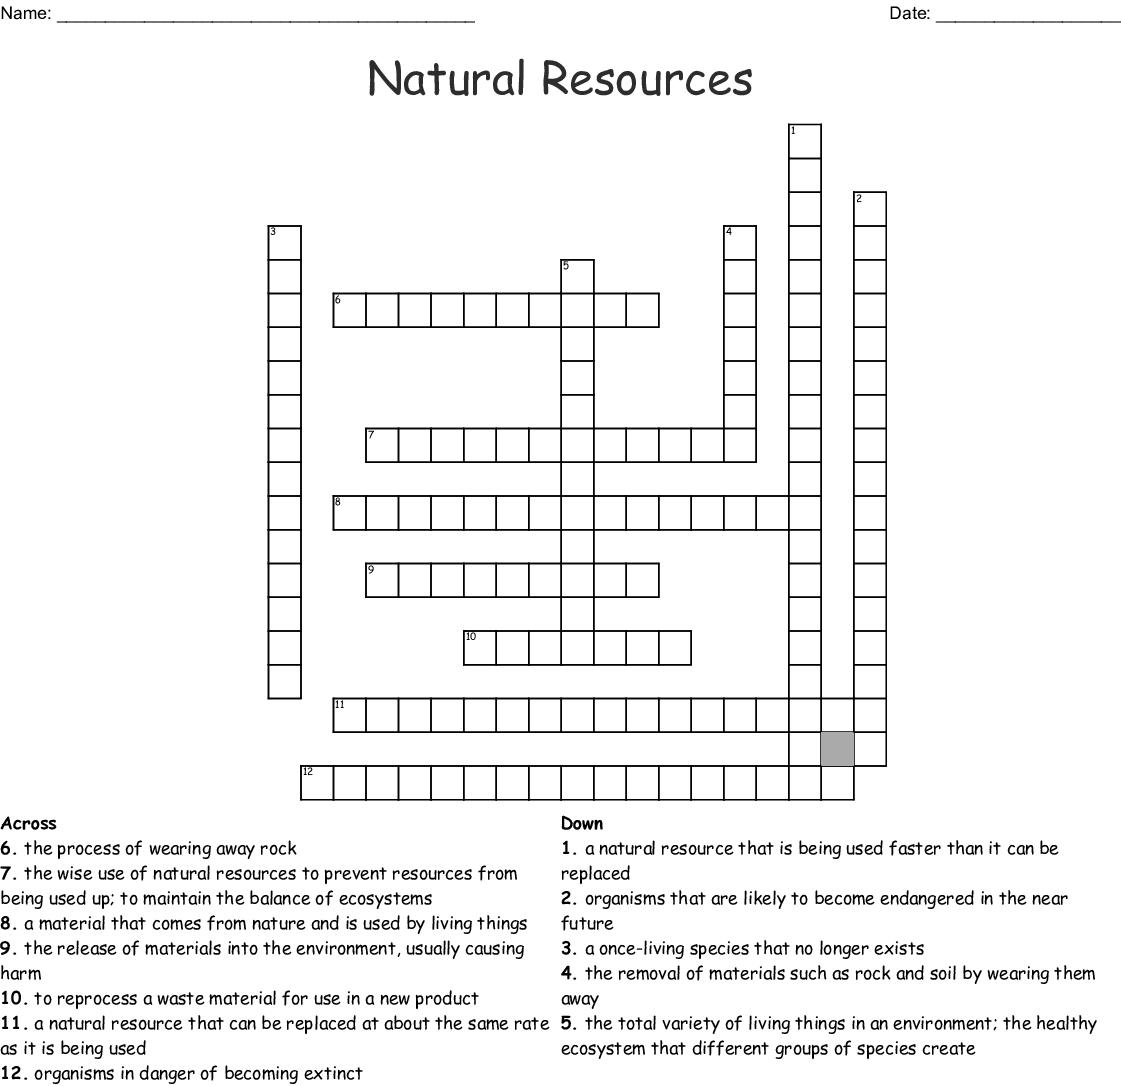 Natural Resources Crossword